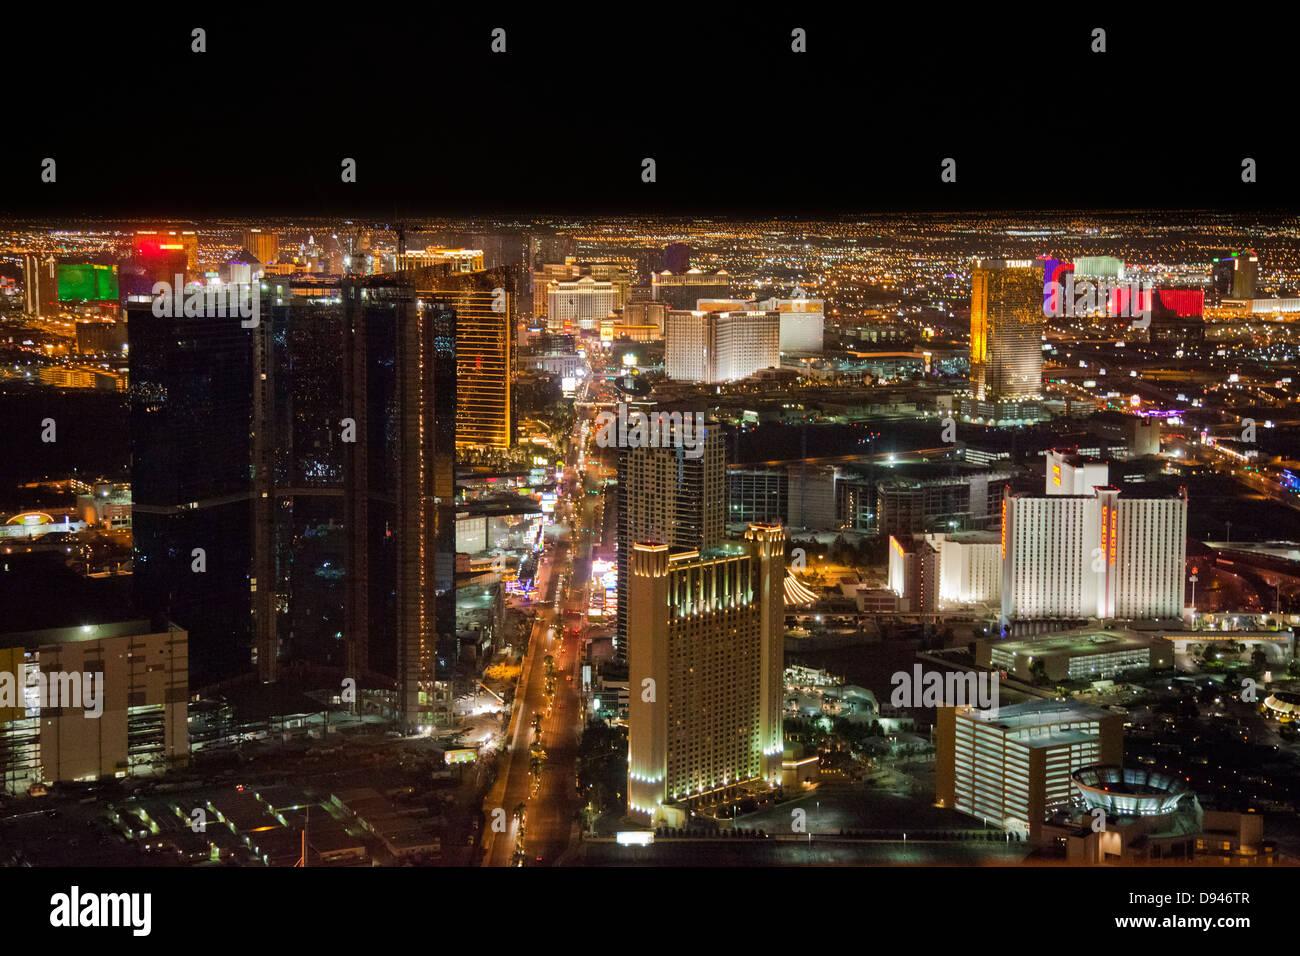 High angle view of Las Vegas illuminate at night - Stock Image